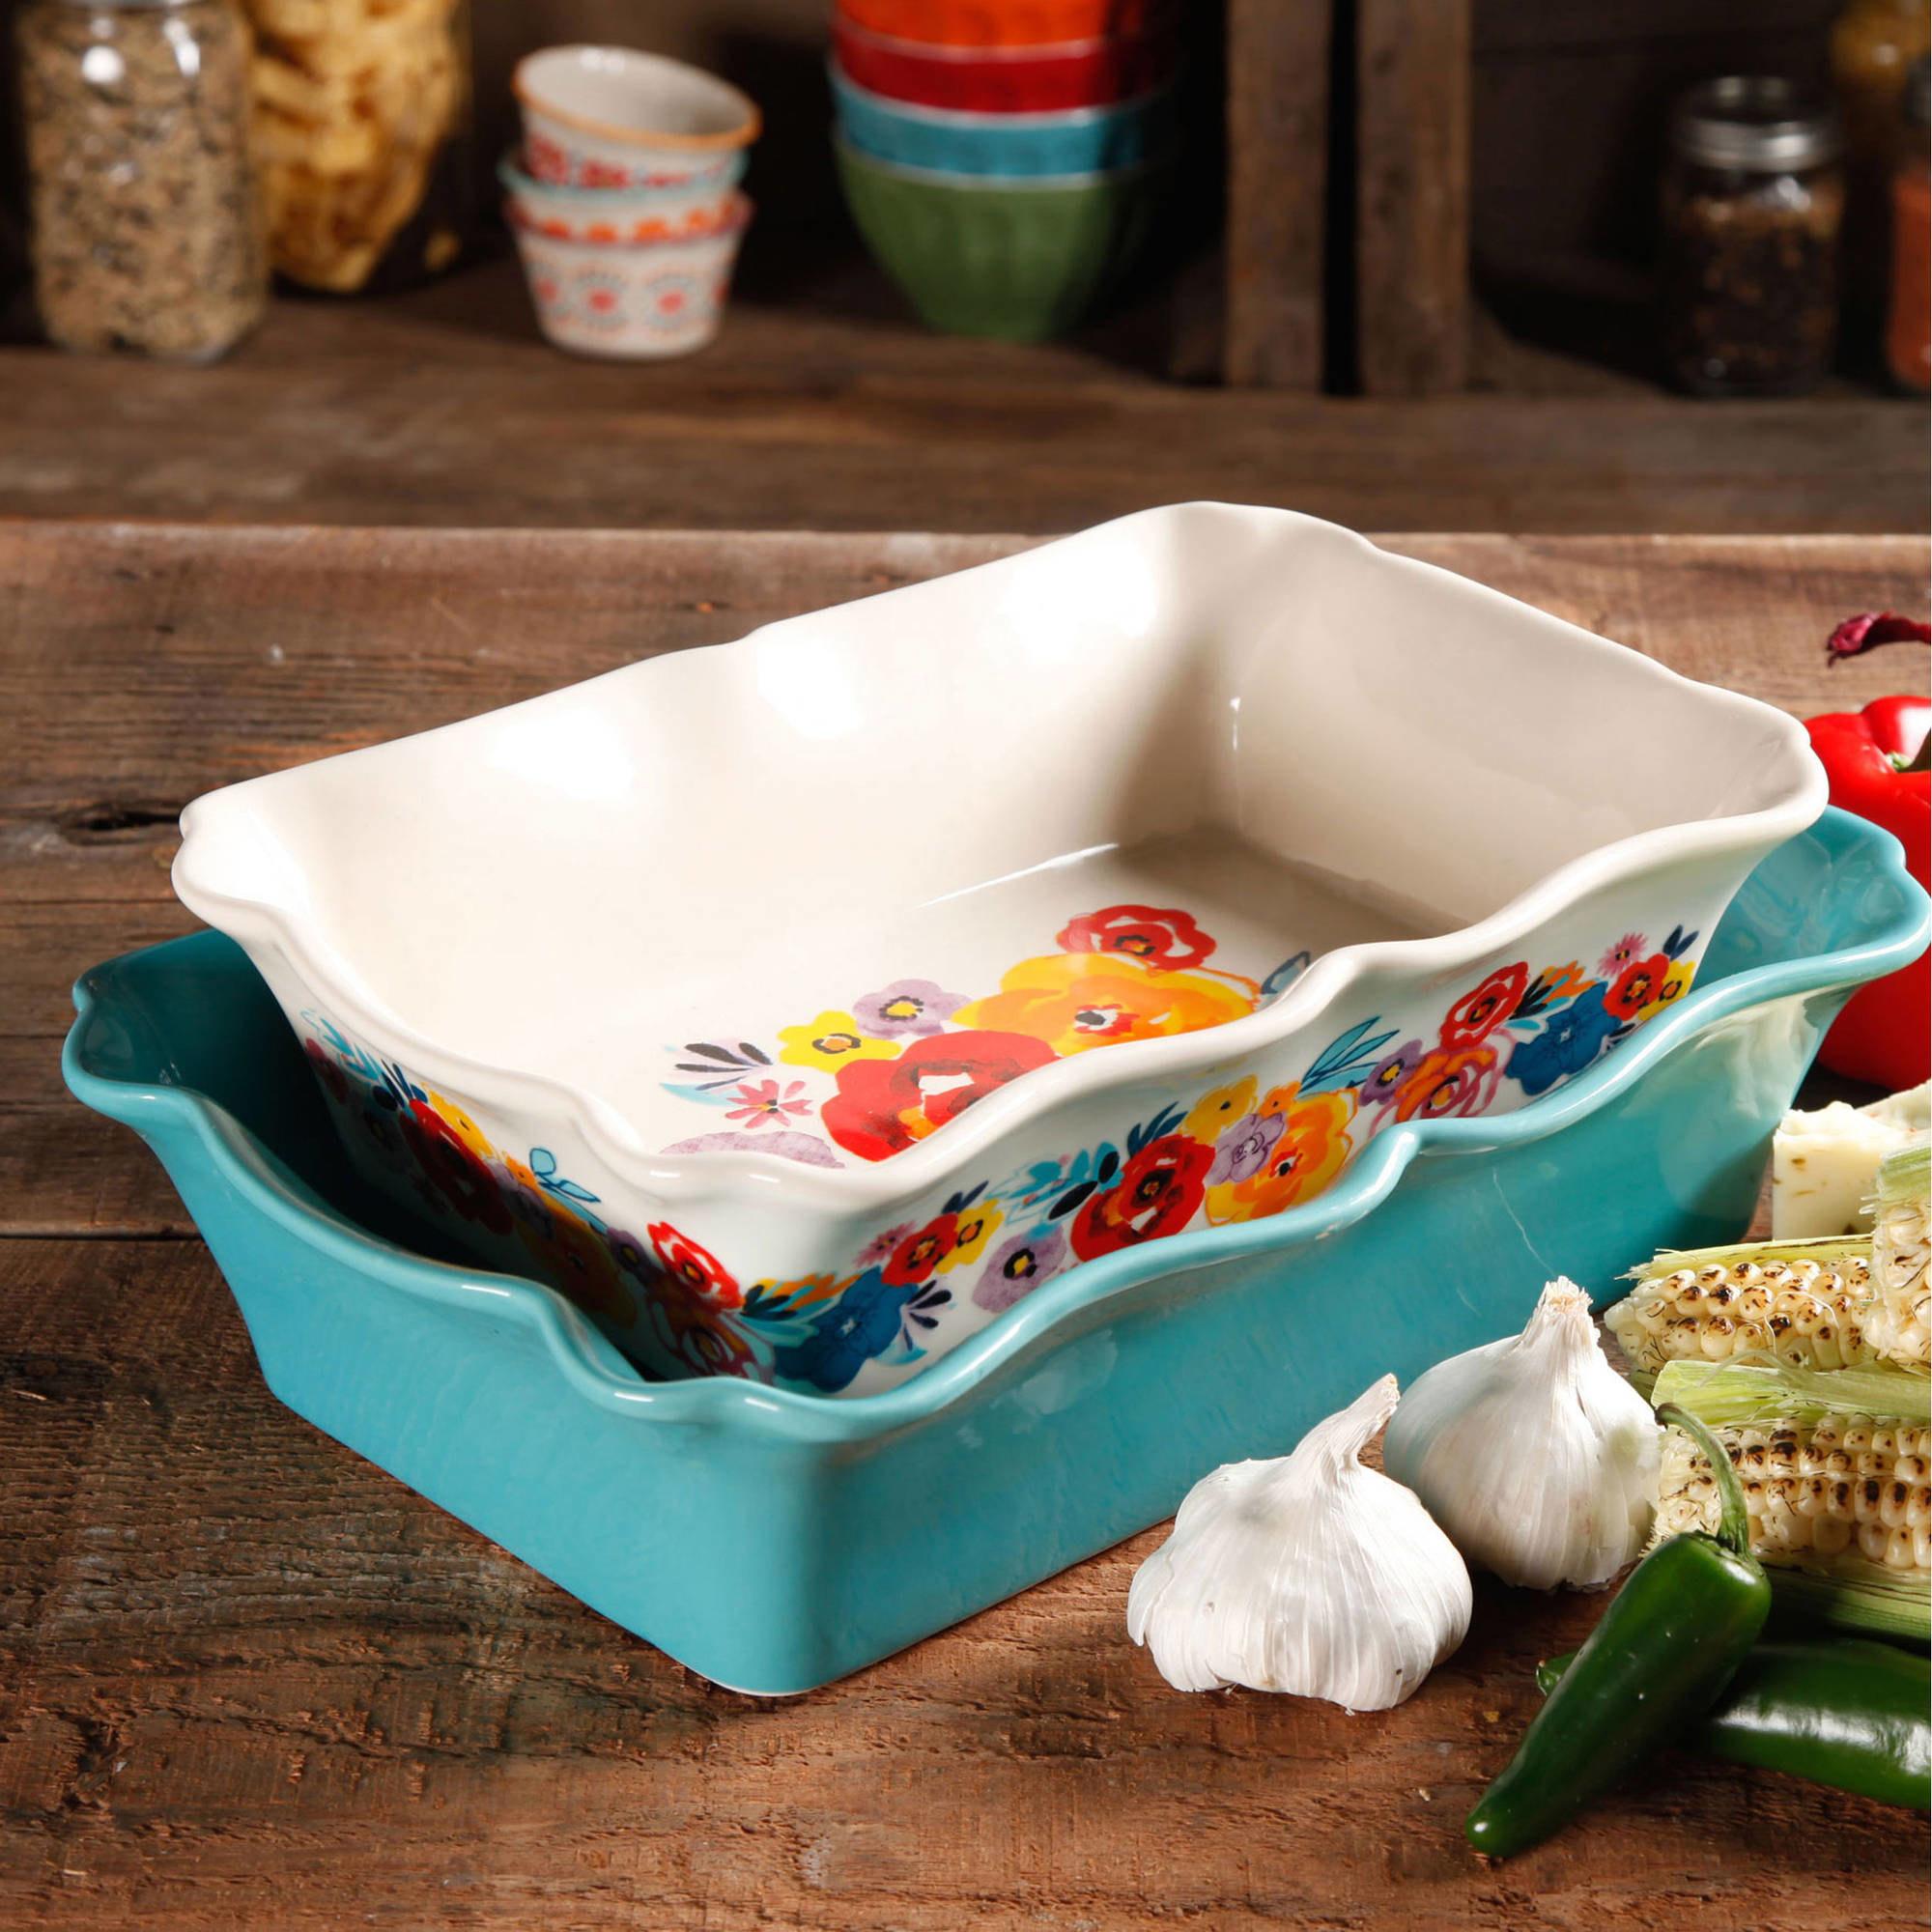 The pans in the color flea market floral